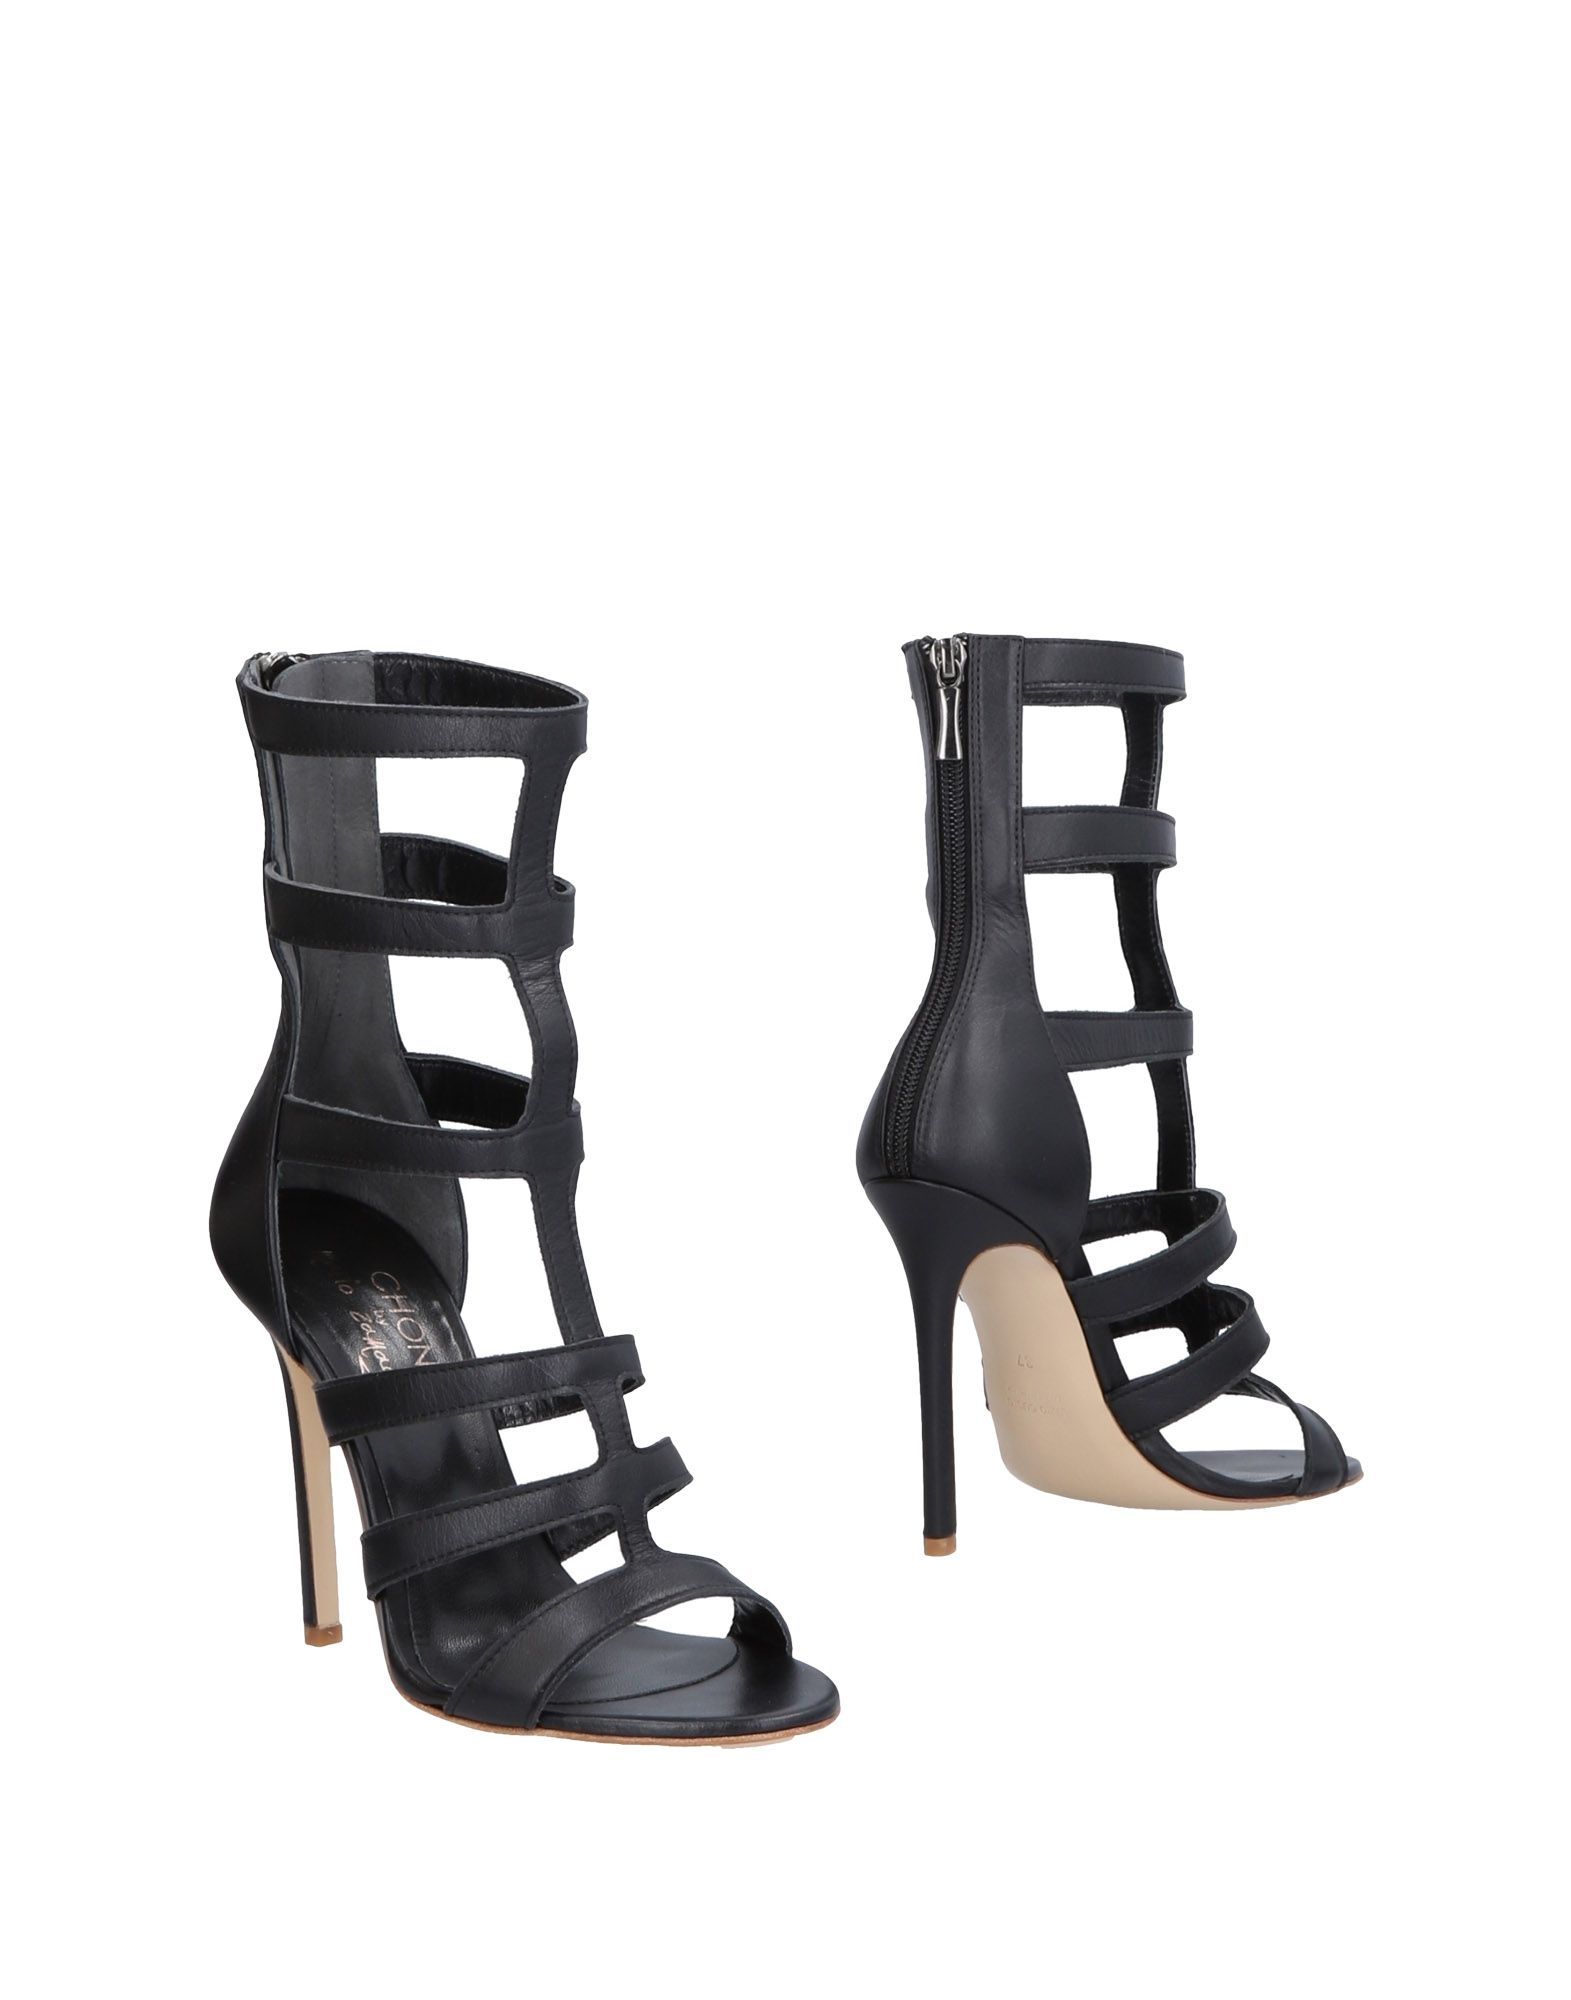 Chon Per Mario Zamagna Stiefelette Damen  11462870TX Heiße Schuhe